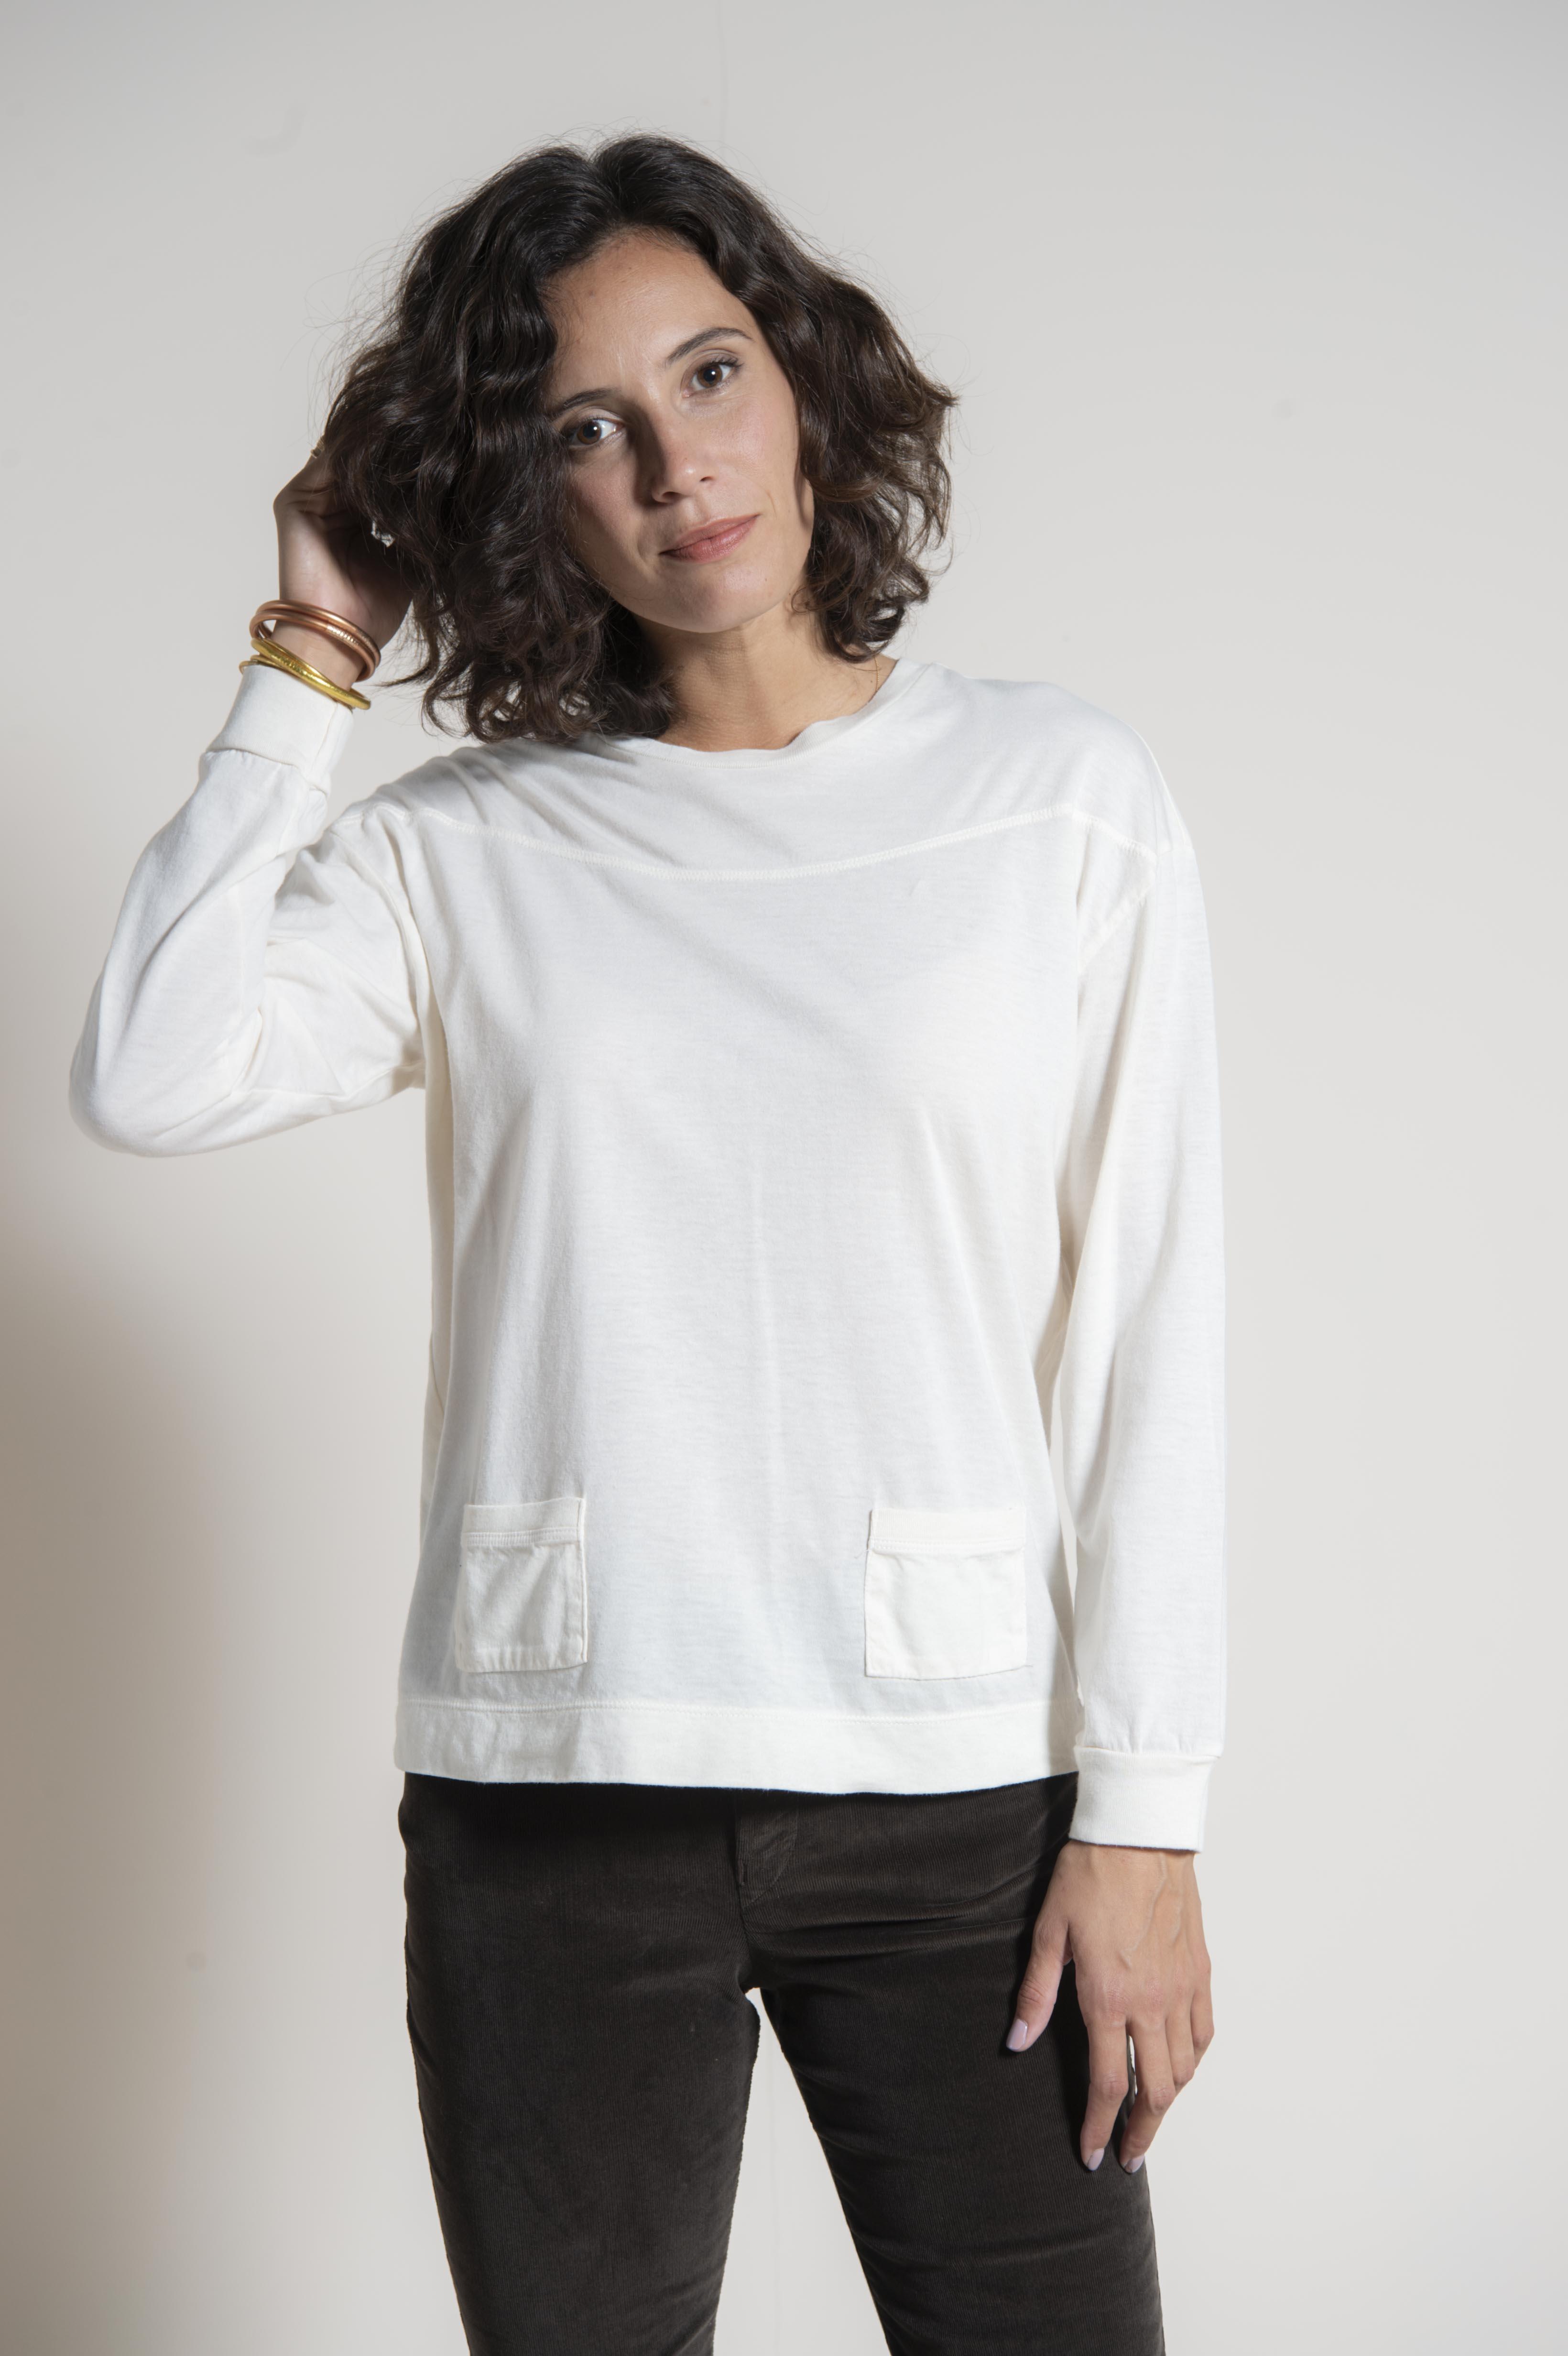 85% cotton 15% cashmere jersey t-shirt